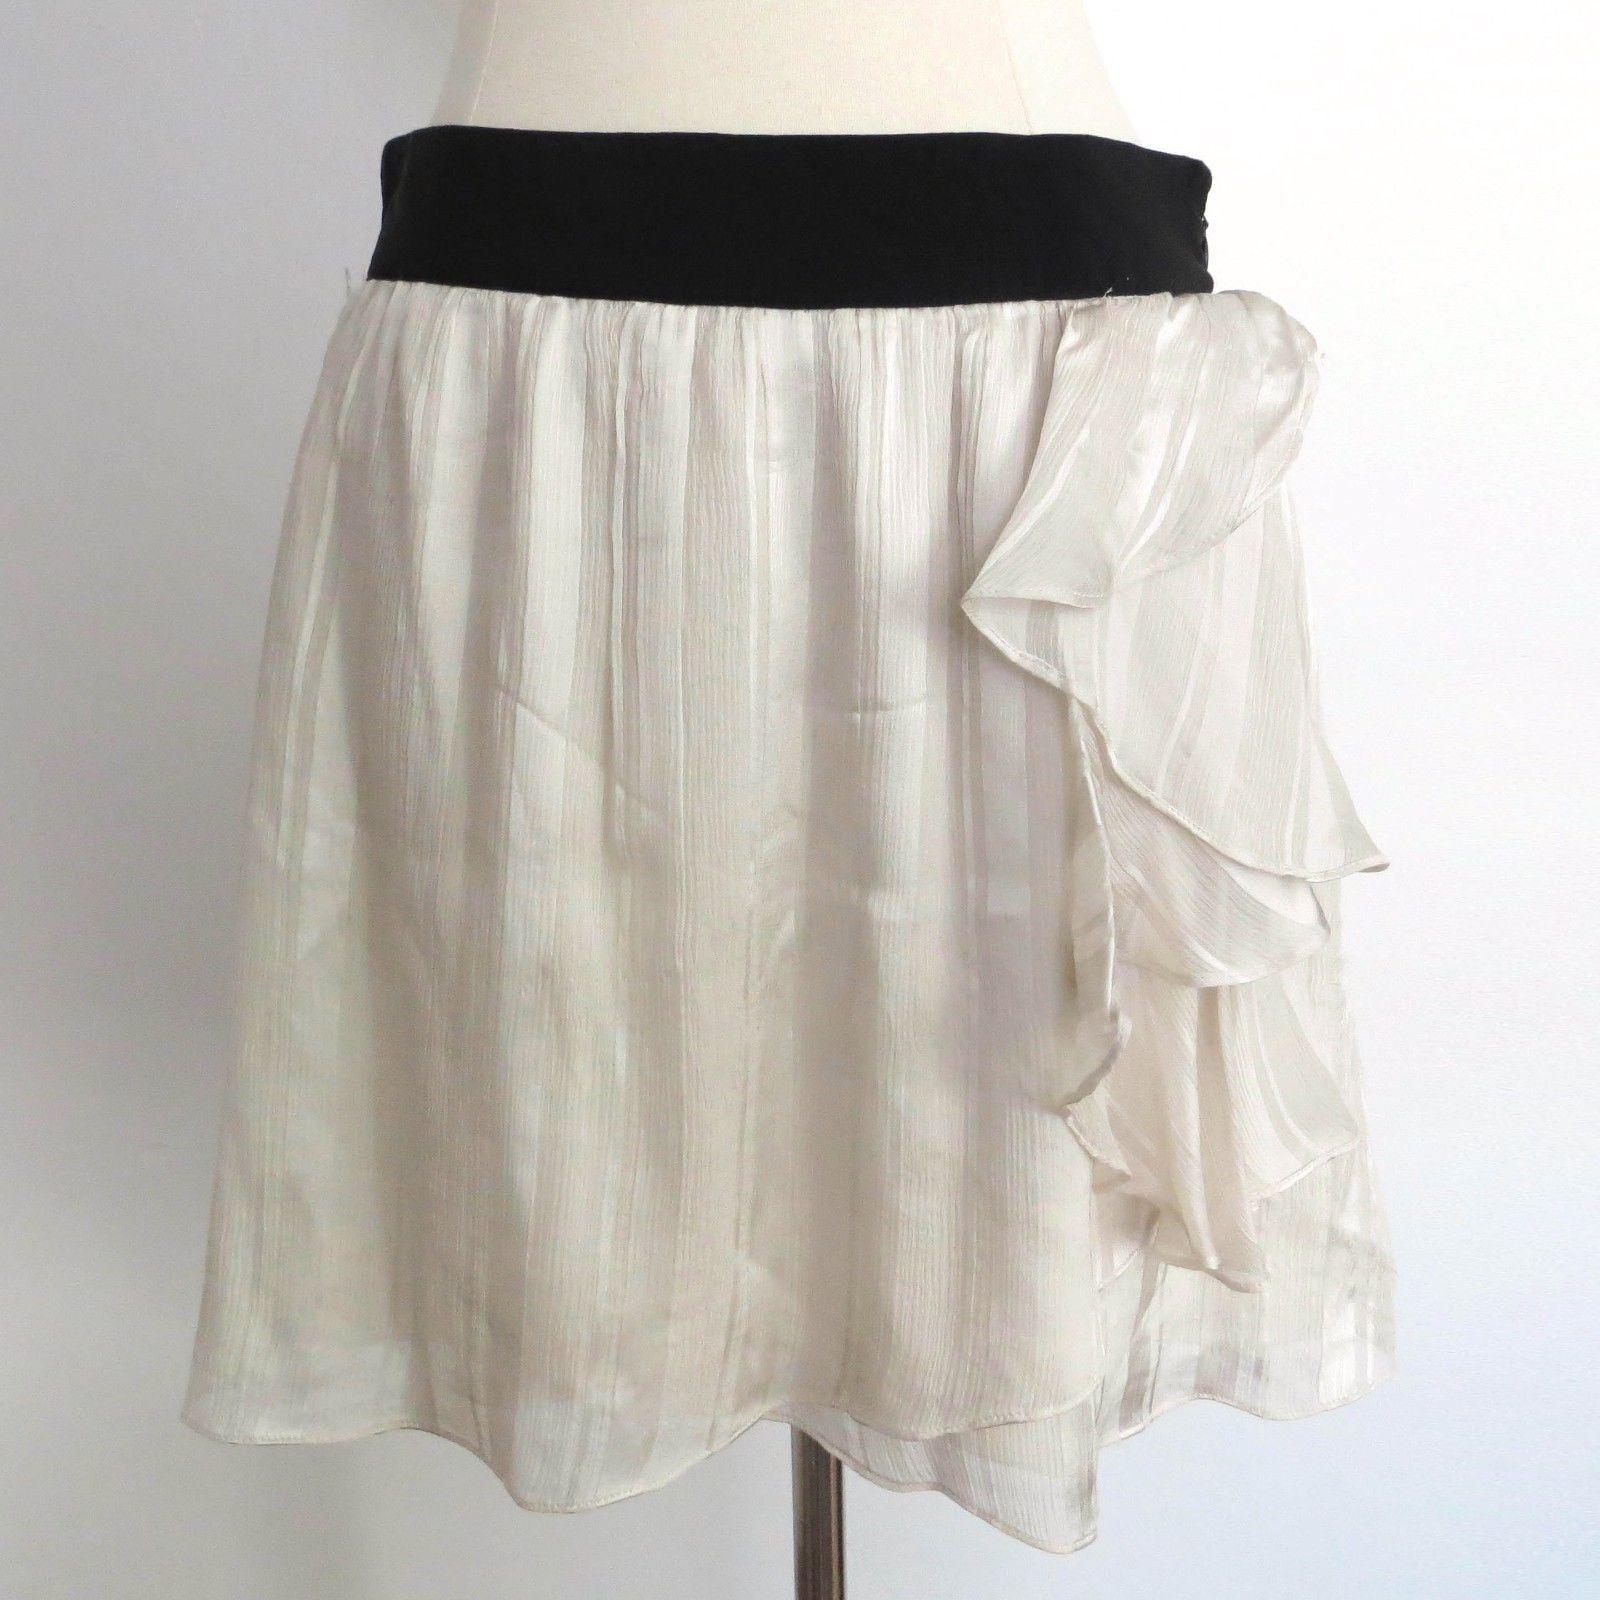 56e09d3a06 57. 57. Previous. Club Monaco size 2 pearl ivory knee length skirt  decorative ruffles 100% Silk · Club Monaco ...